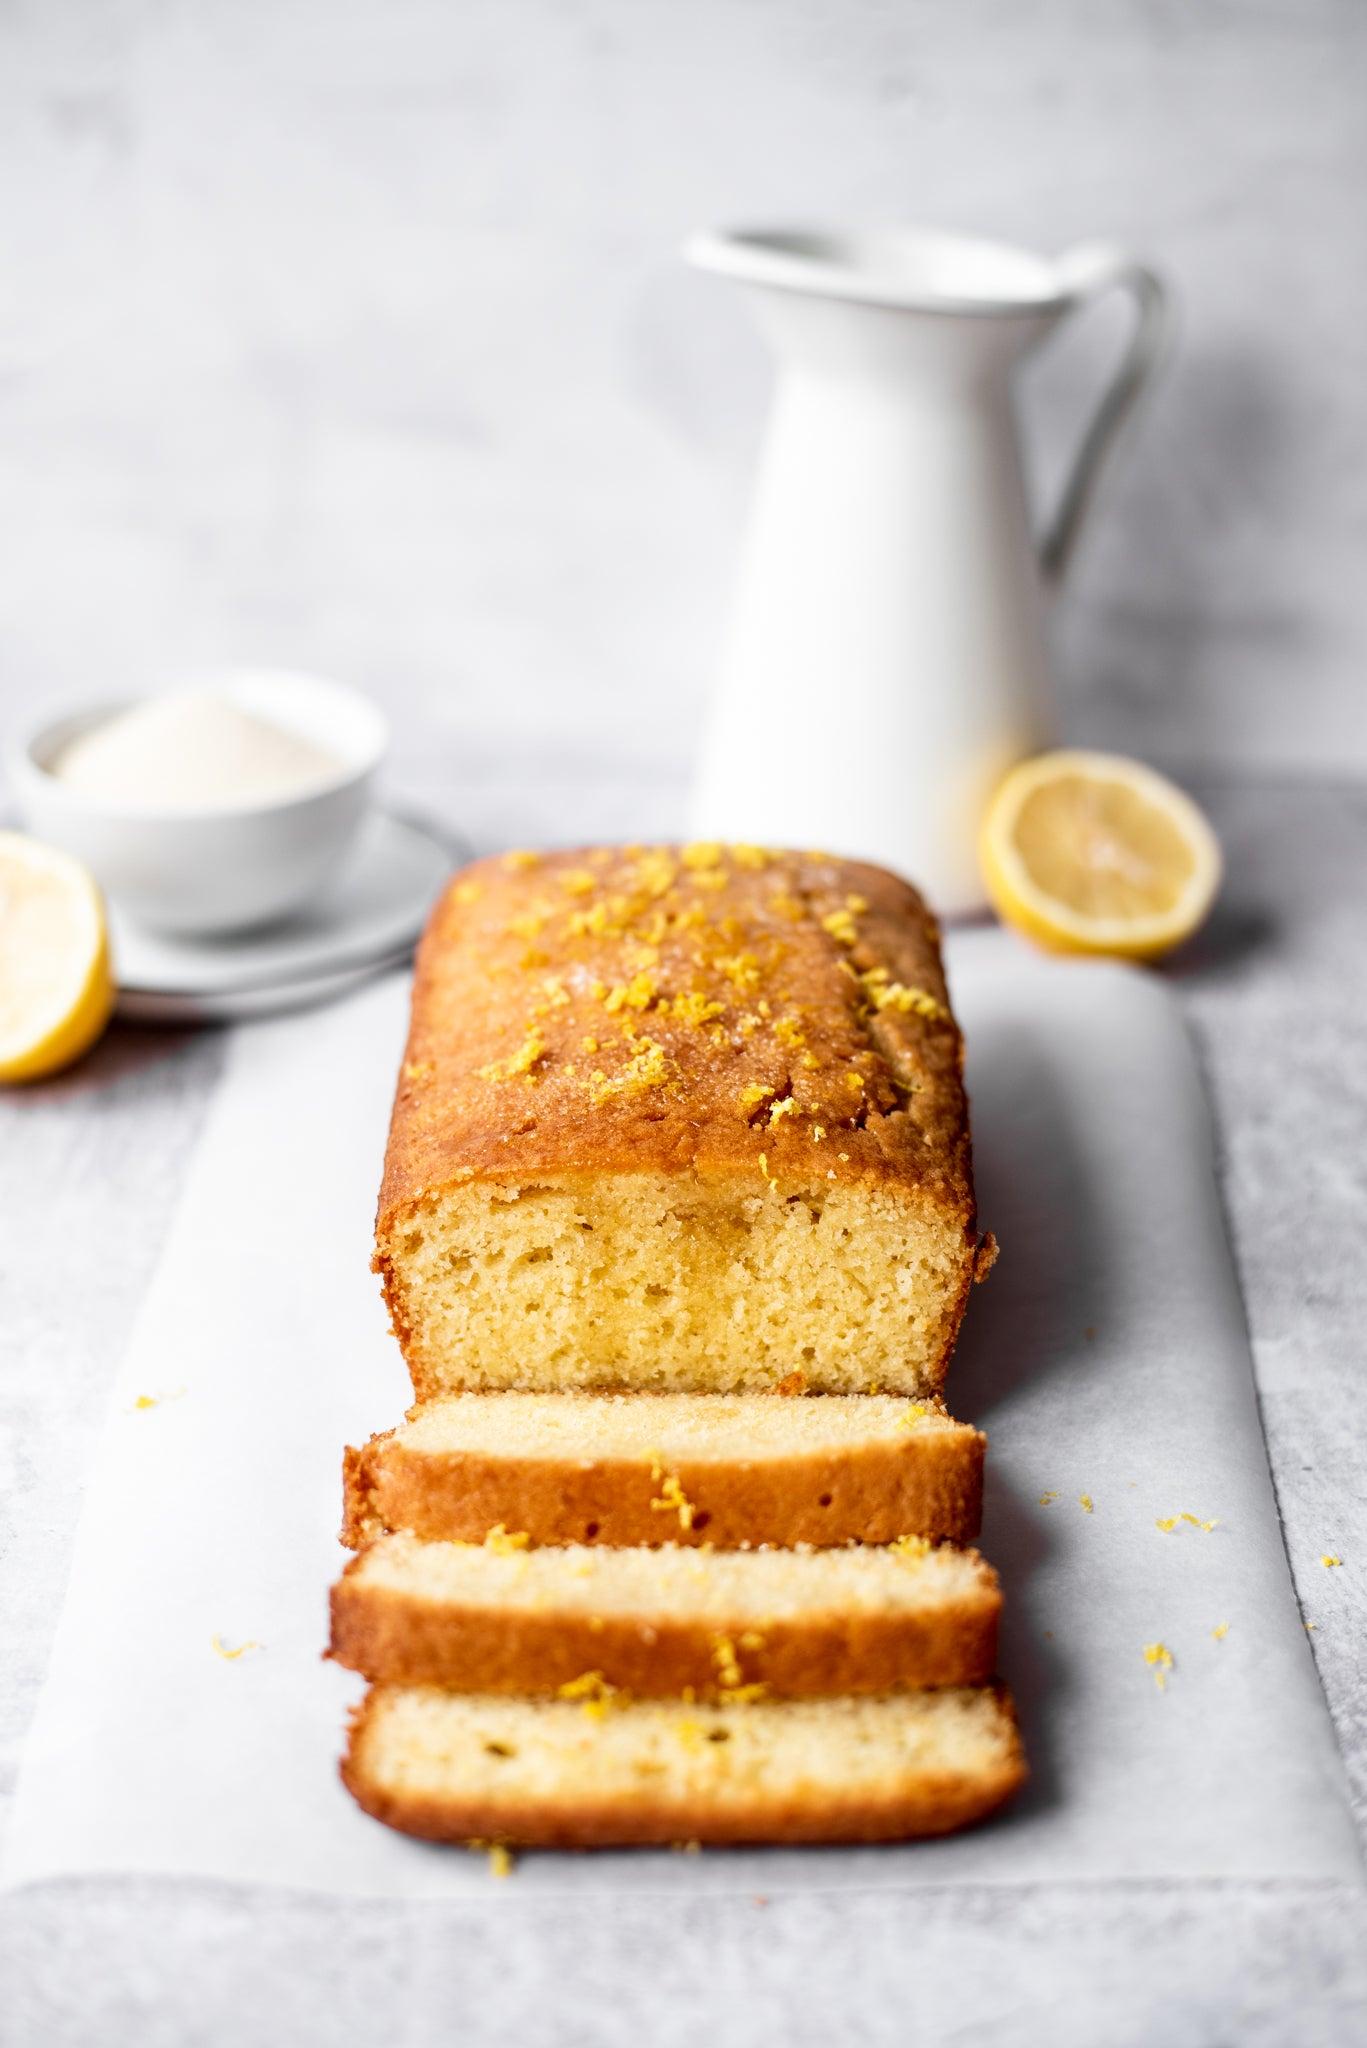 Lemon-Drizzle-Cake-WEB-RES-2.jpg